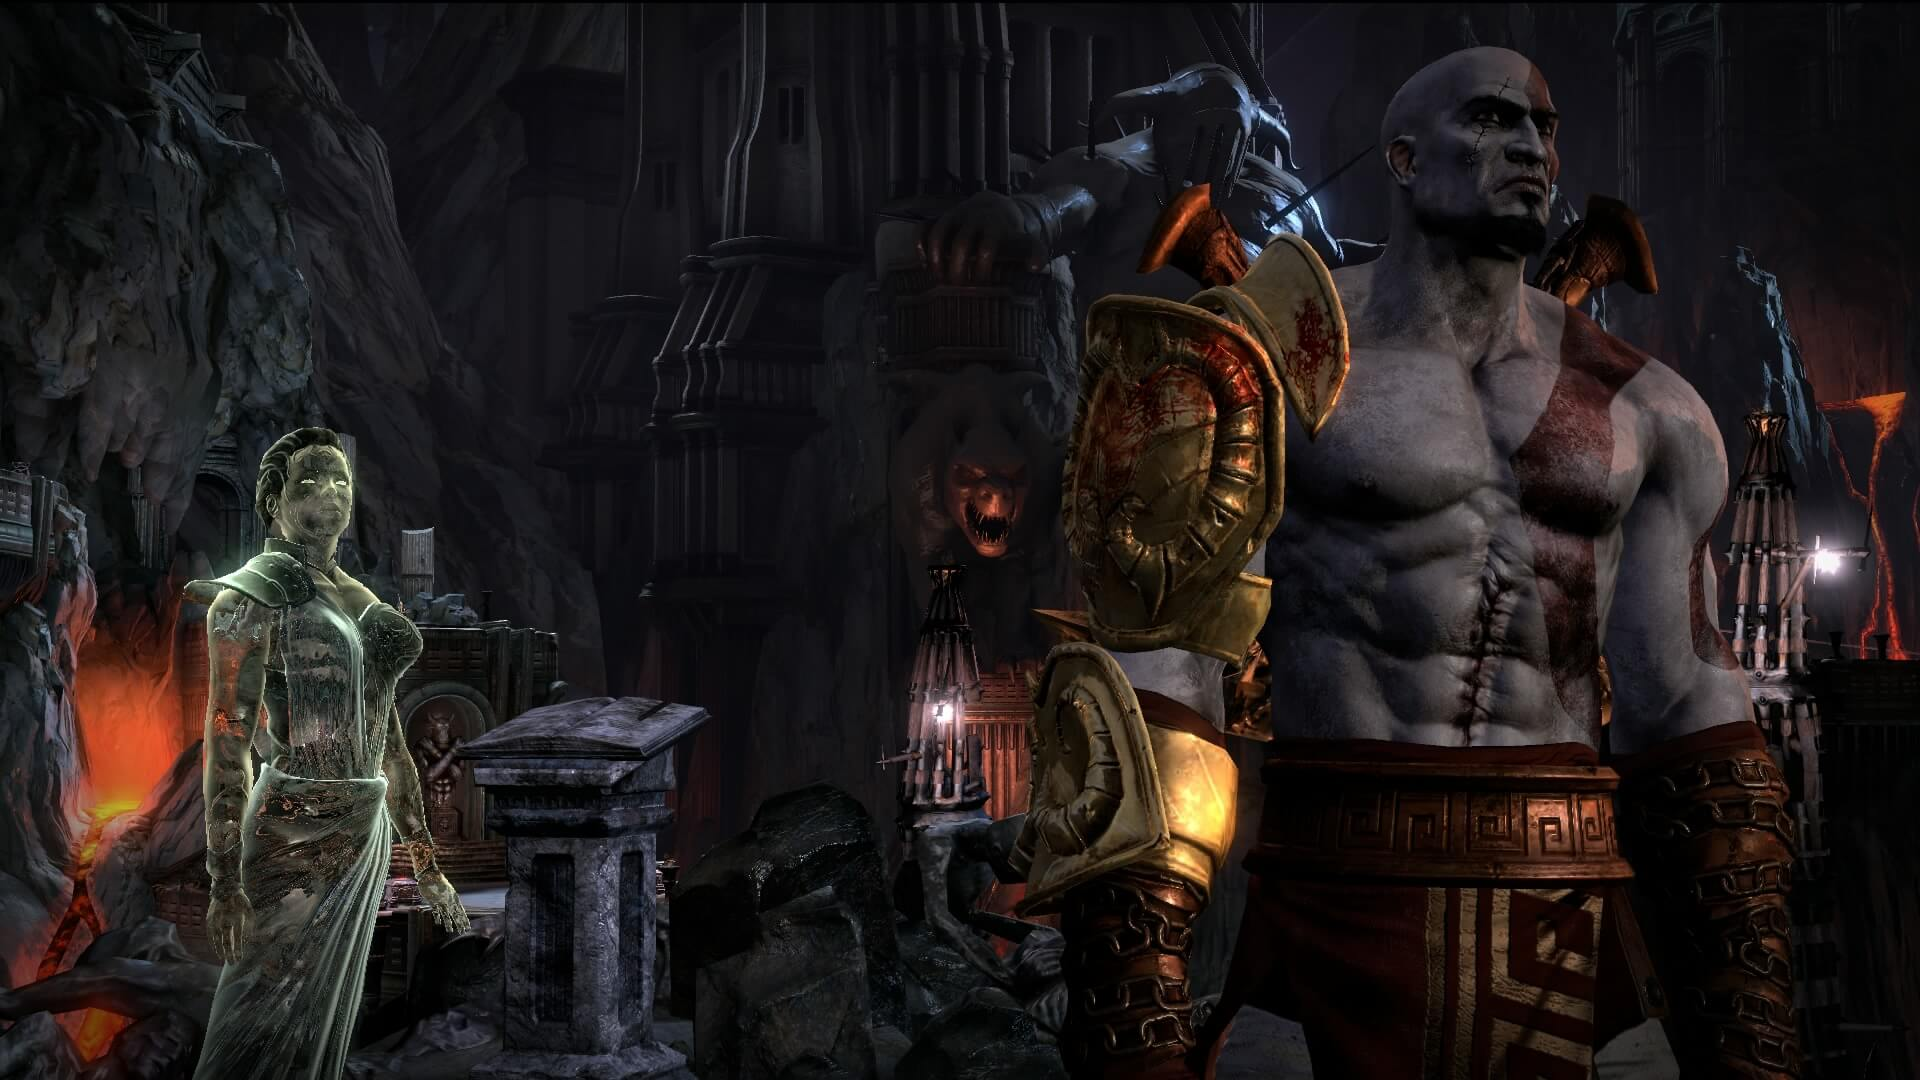 God Of War III Remastered Gameplay Video & Screens